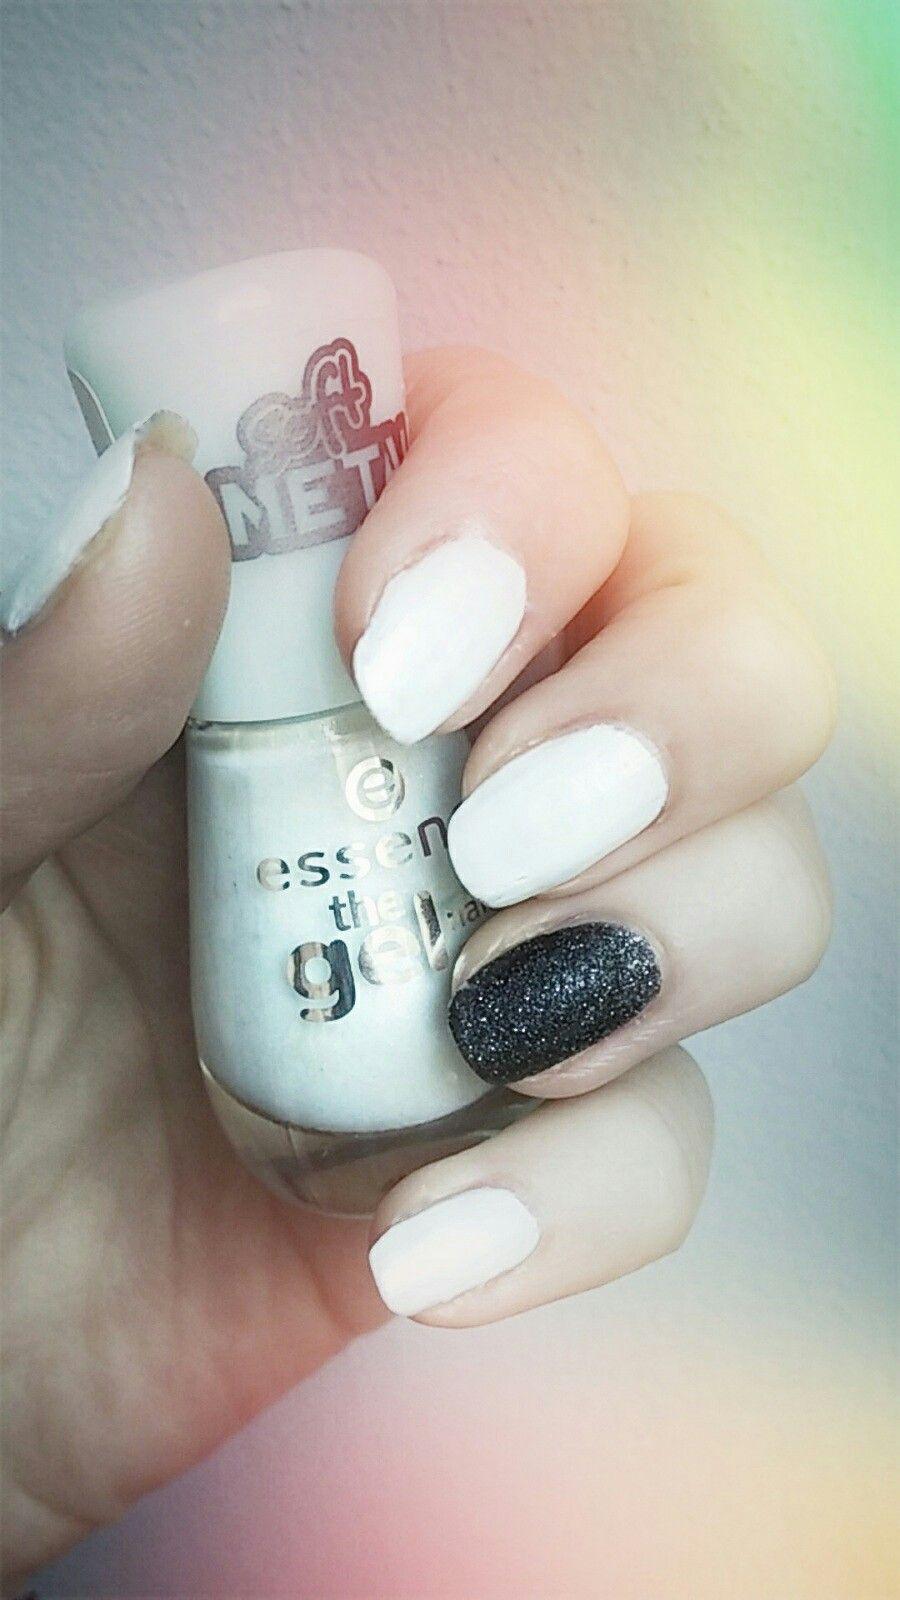 Love This Two Awesome Nailpolish Essence Soft Metal Edition Miss Sporty Crush On You 3d Texture Nails Nailpolish Fashion Cute White Black Trol